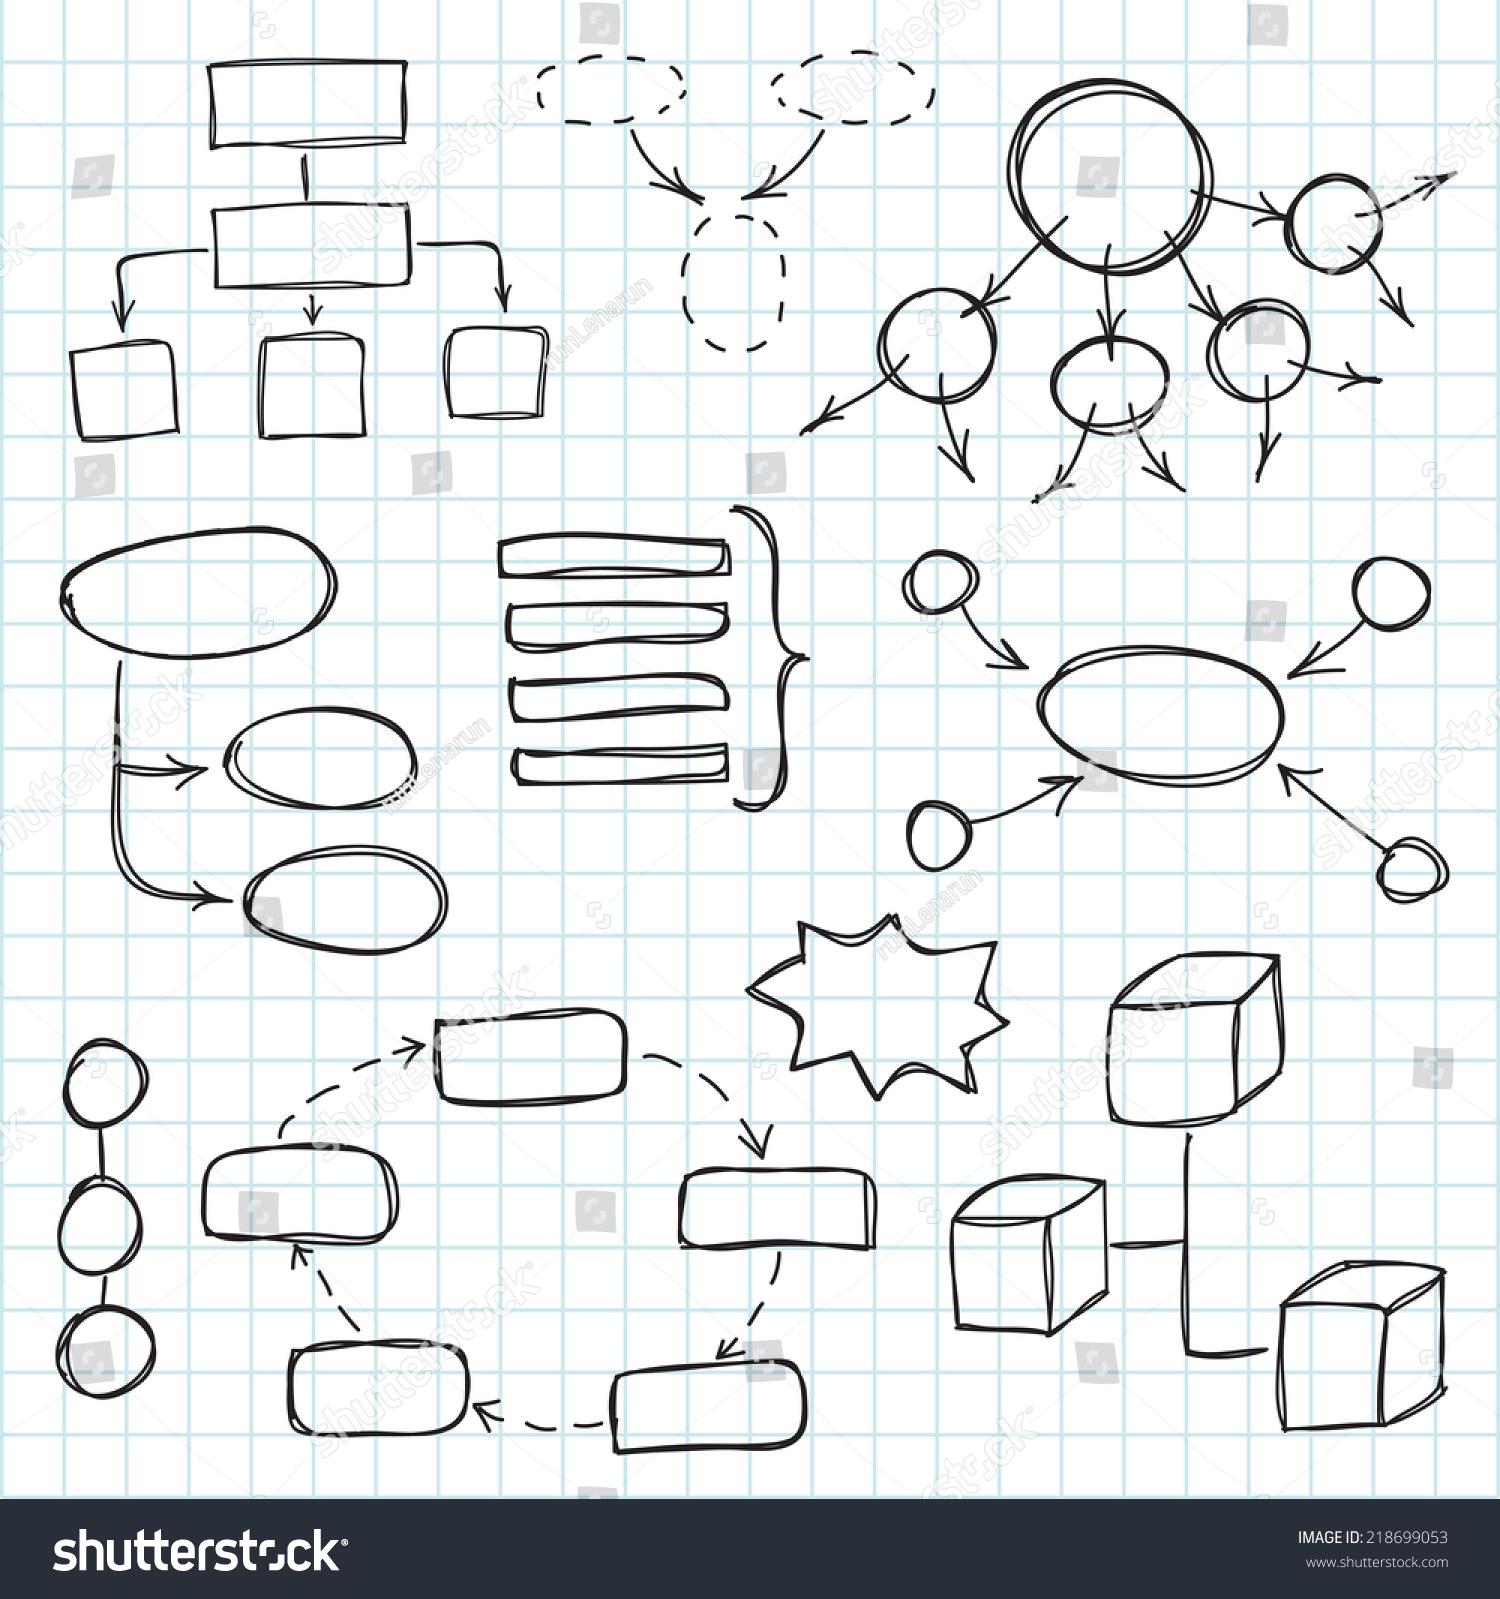 t涂鸦板流程图_